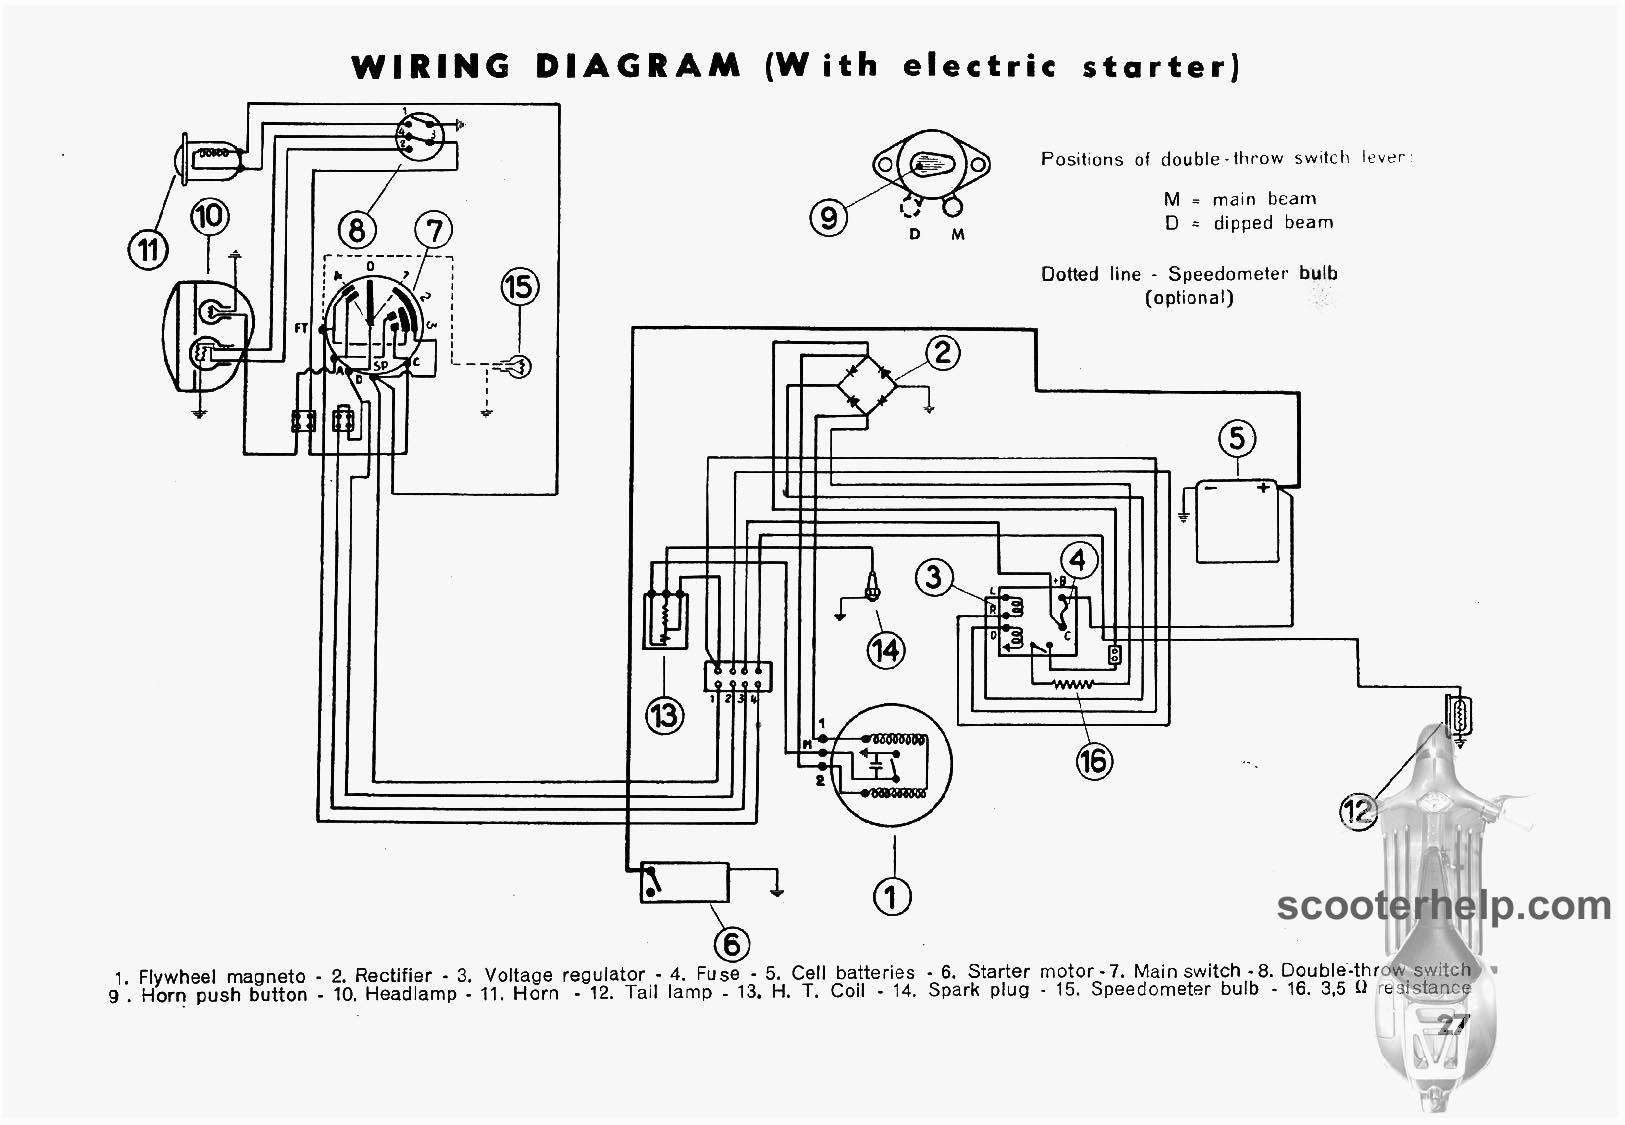 Lambretta D Wiring Diagram Circuit Diagrams Wire Data Parts Rh Sellfie Co